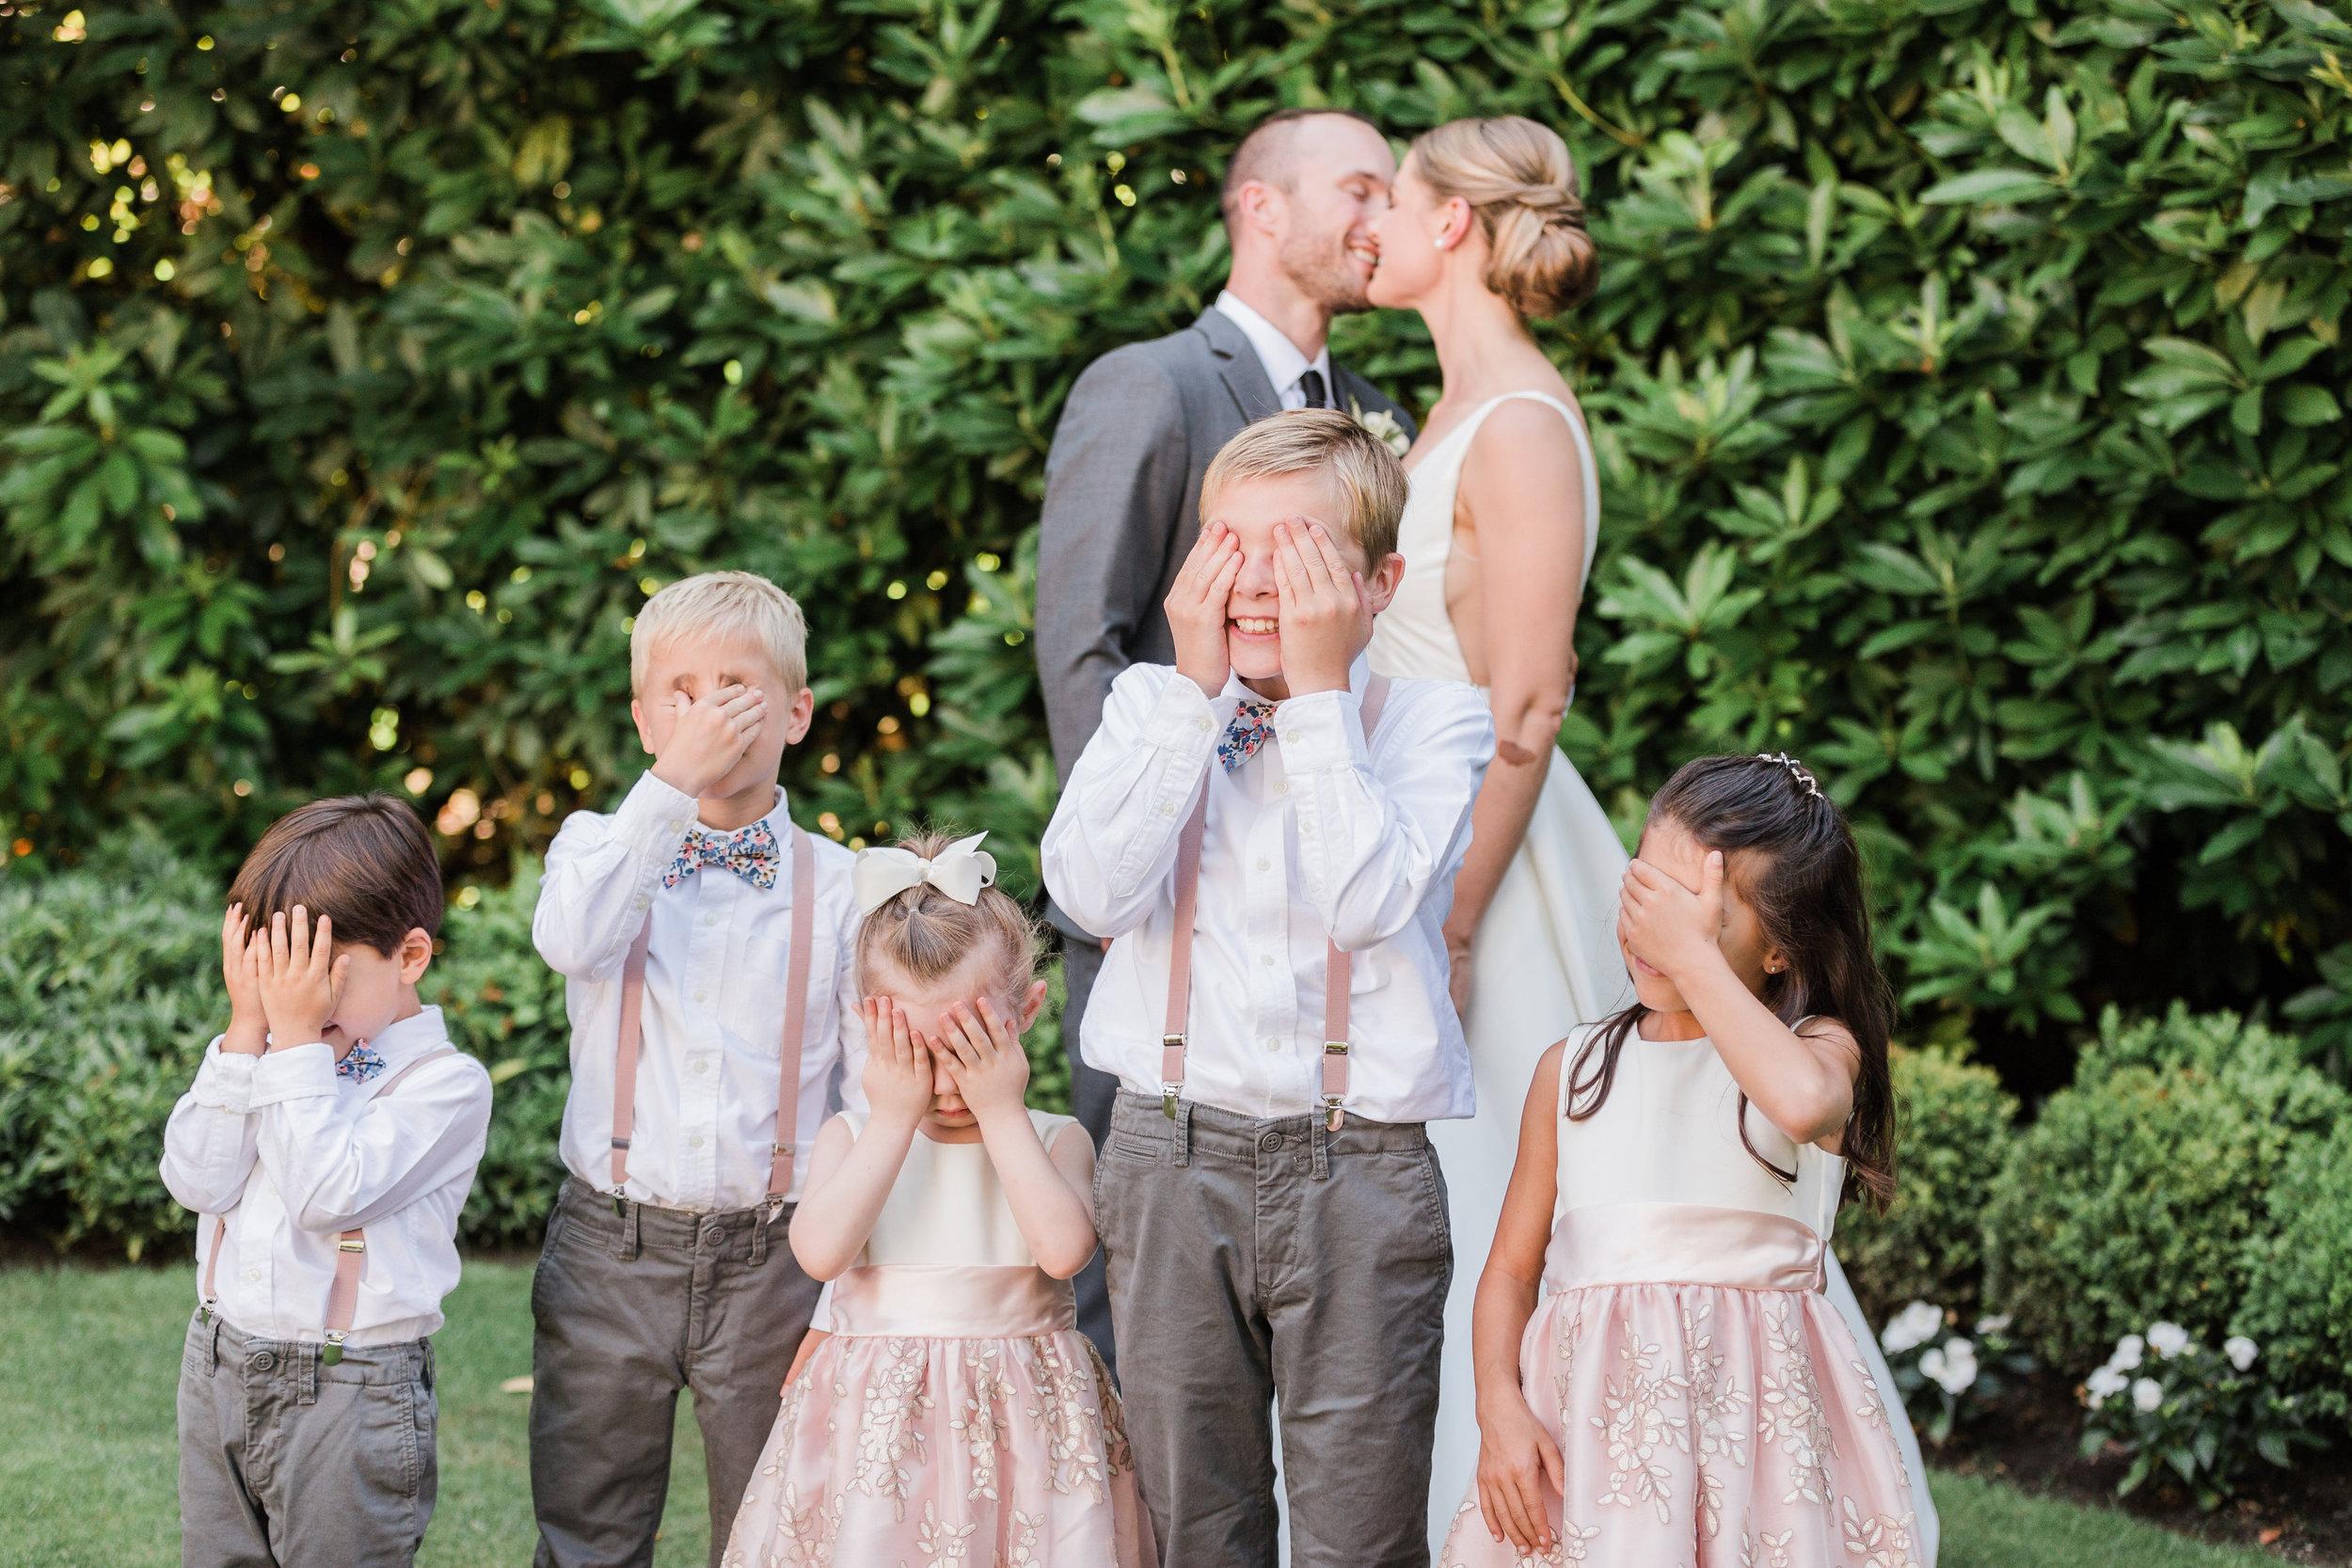 Bridalbliss.com | Portland Seattle Bend Wedding | Oregon Washington Event Planning and Design | Mckenna Rachelle Photography